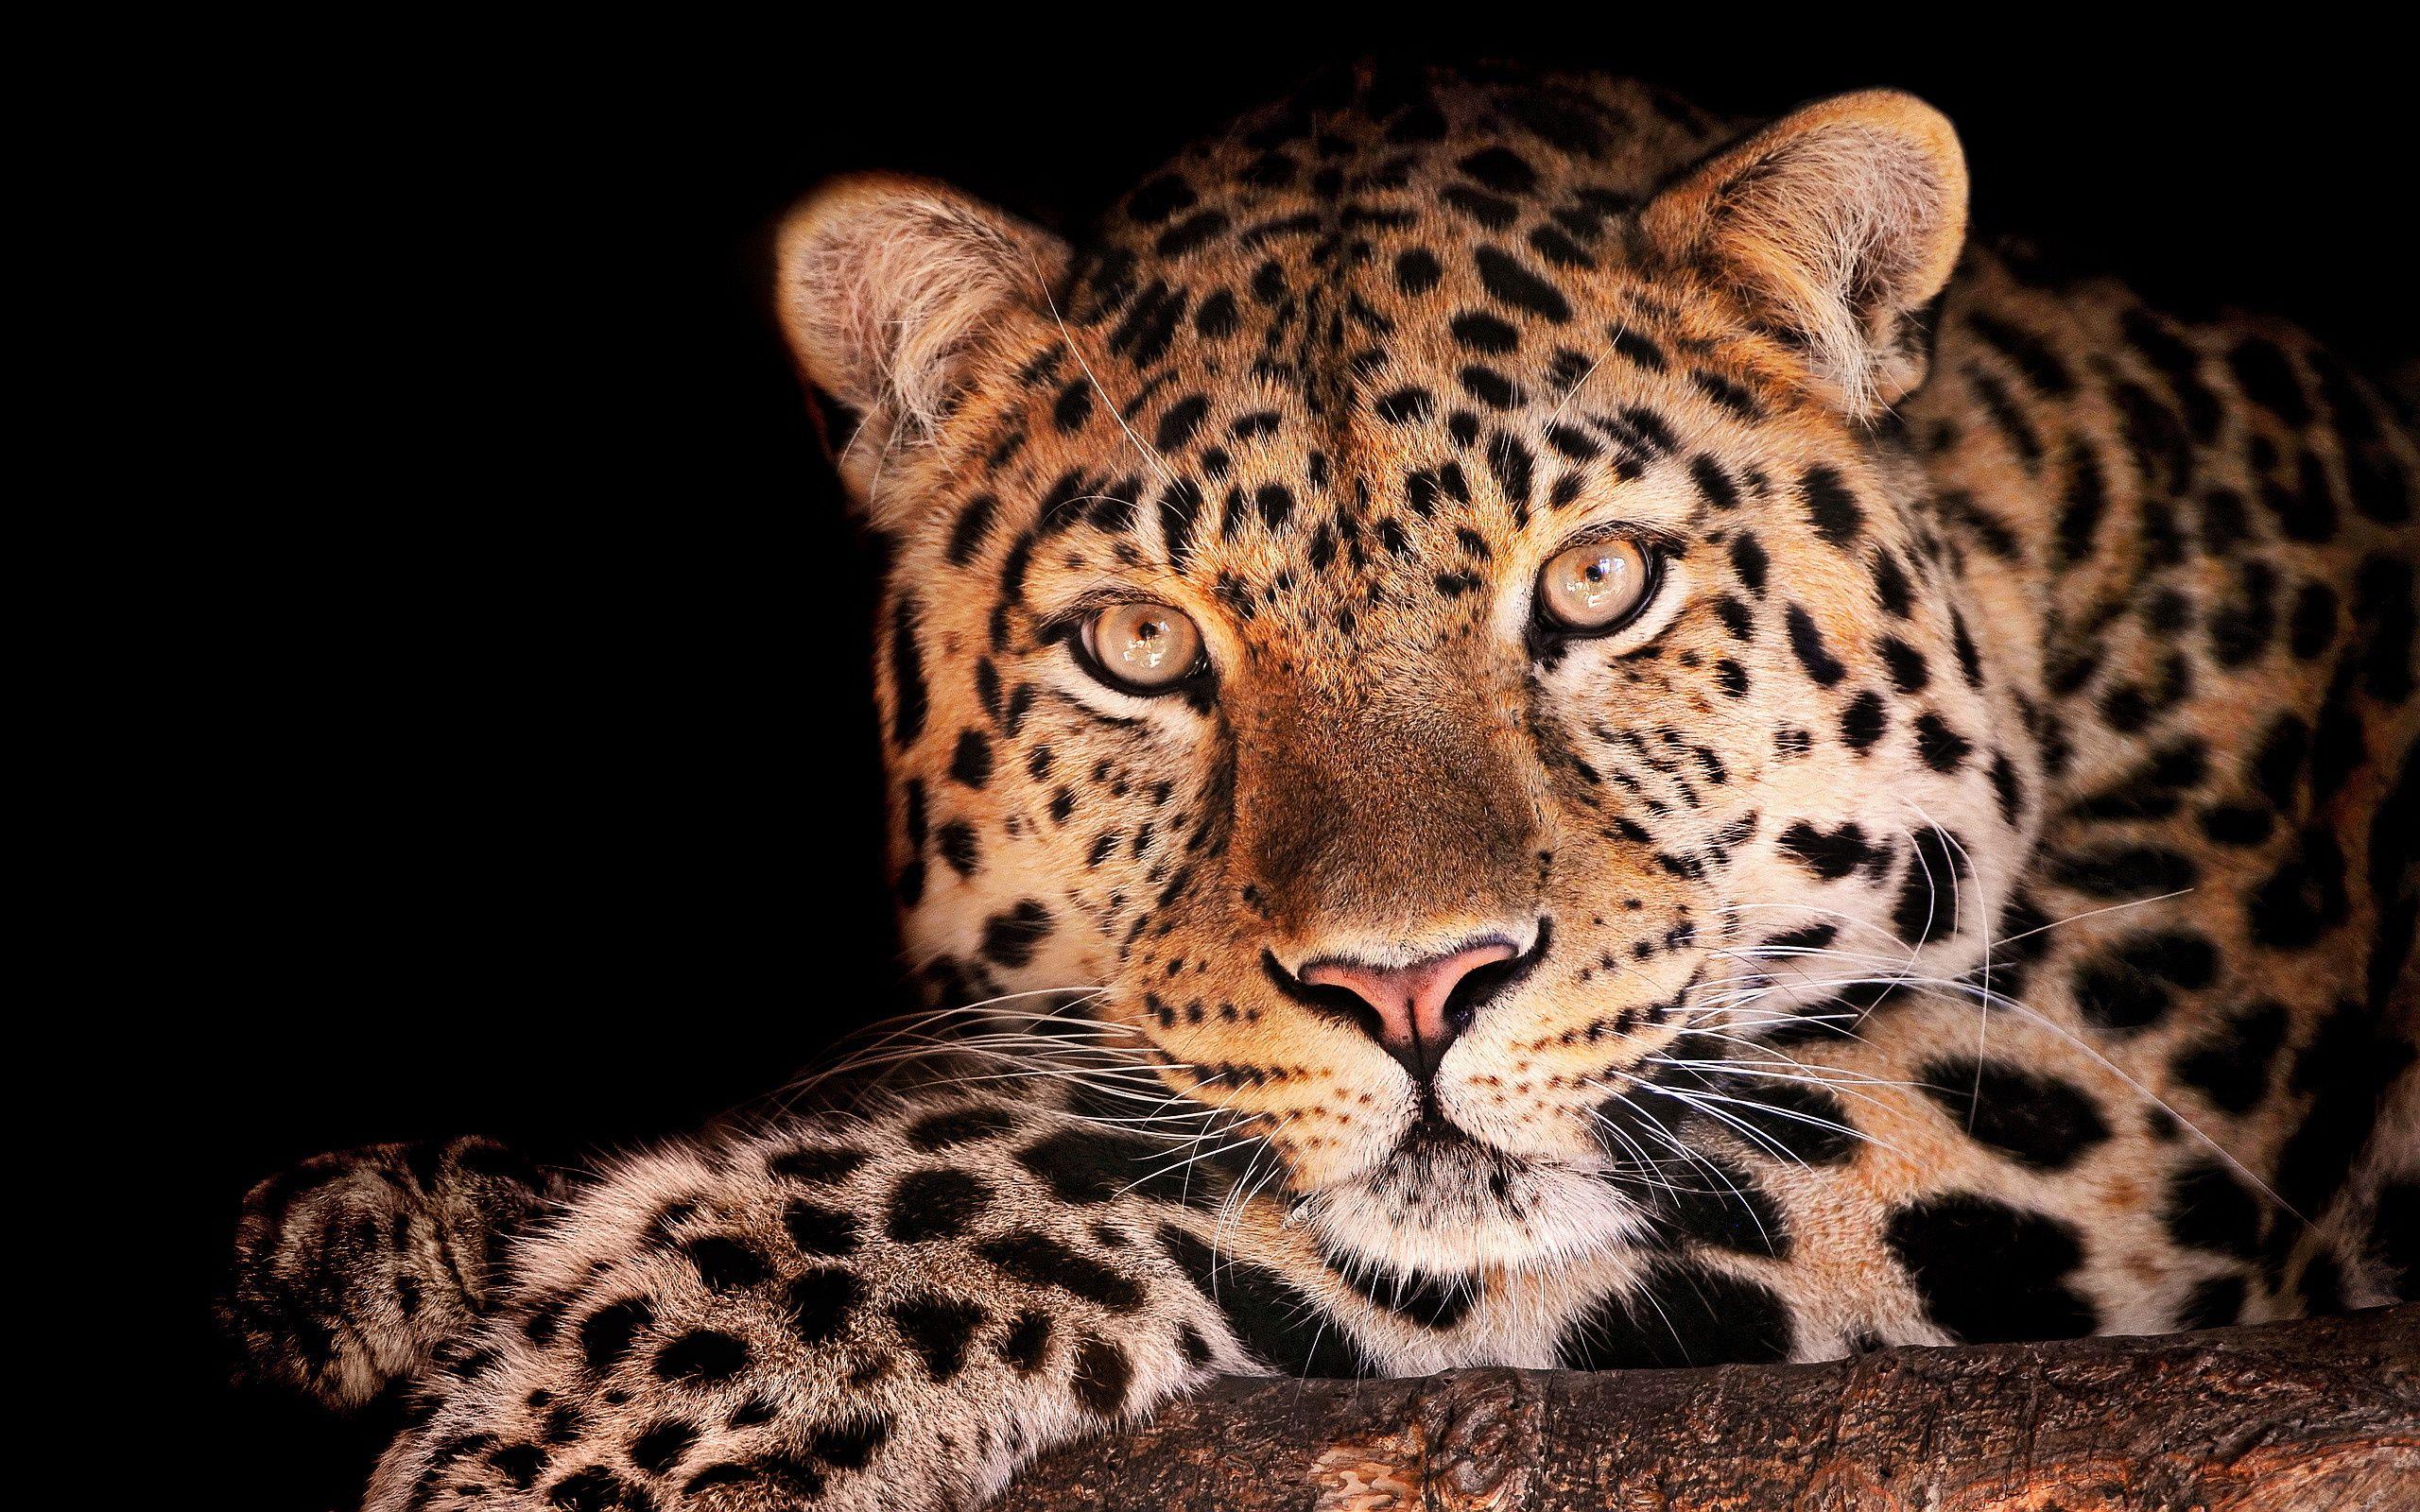 Top Wallpaper Mac Snow Leopard - 6bd2aa566818dc3f8dbfb2a9da9d046a  HD_111957.jpg